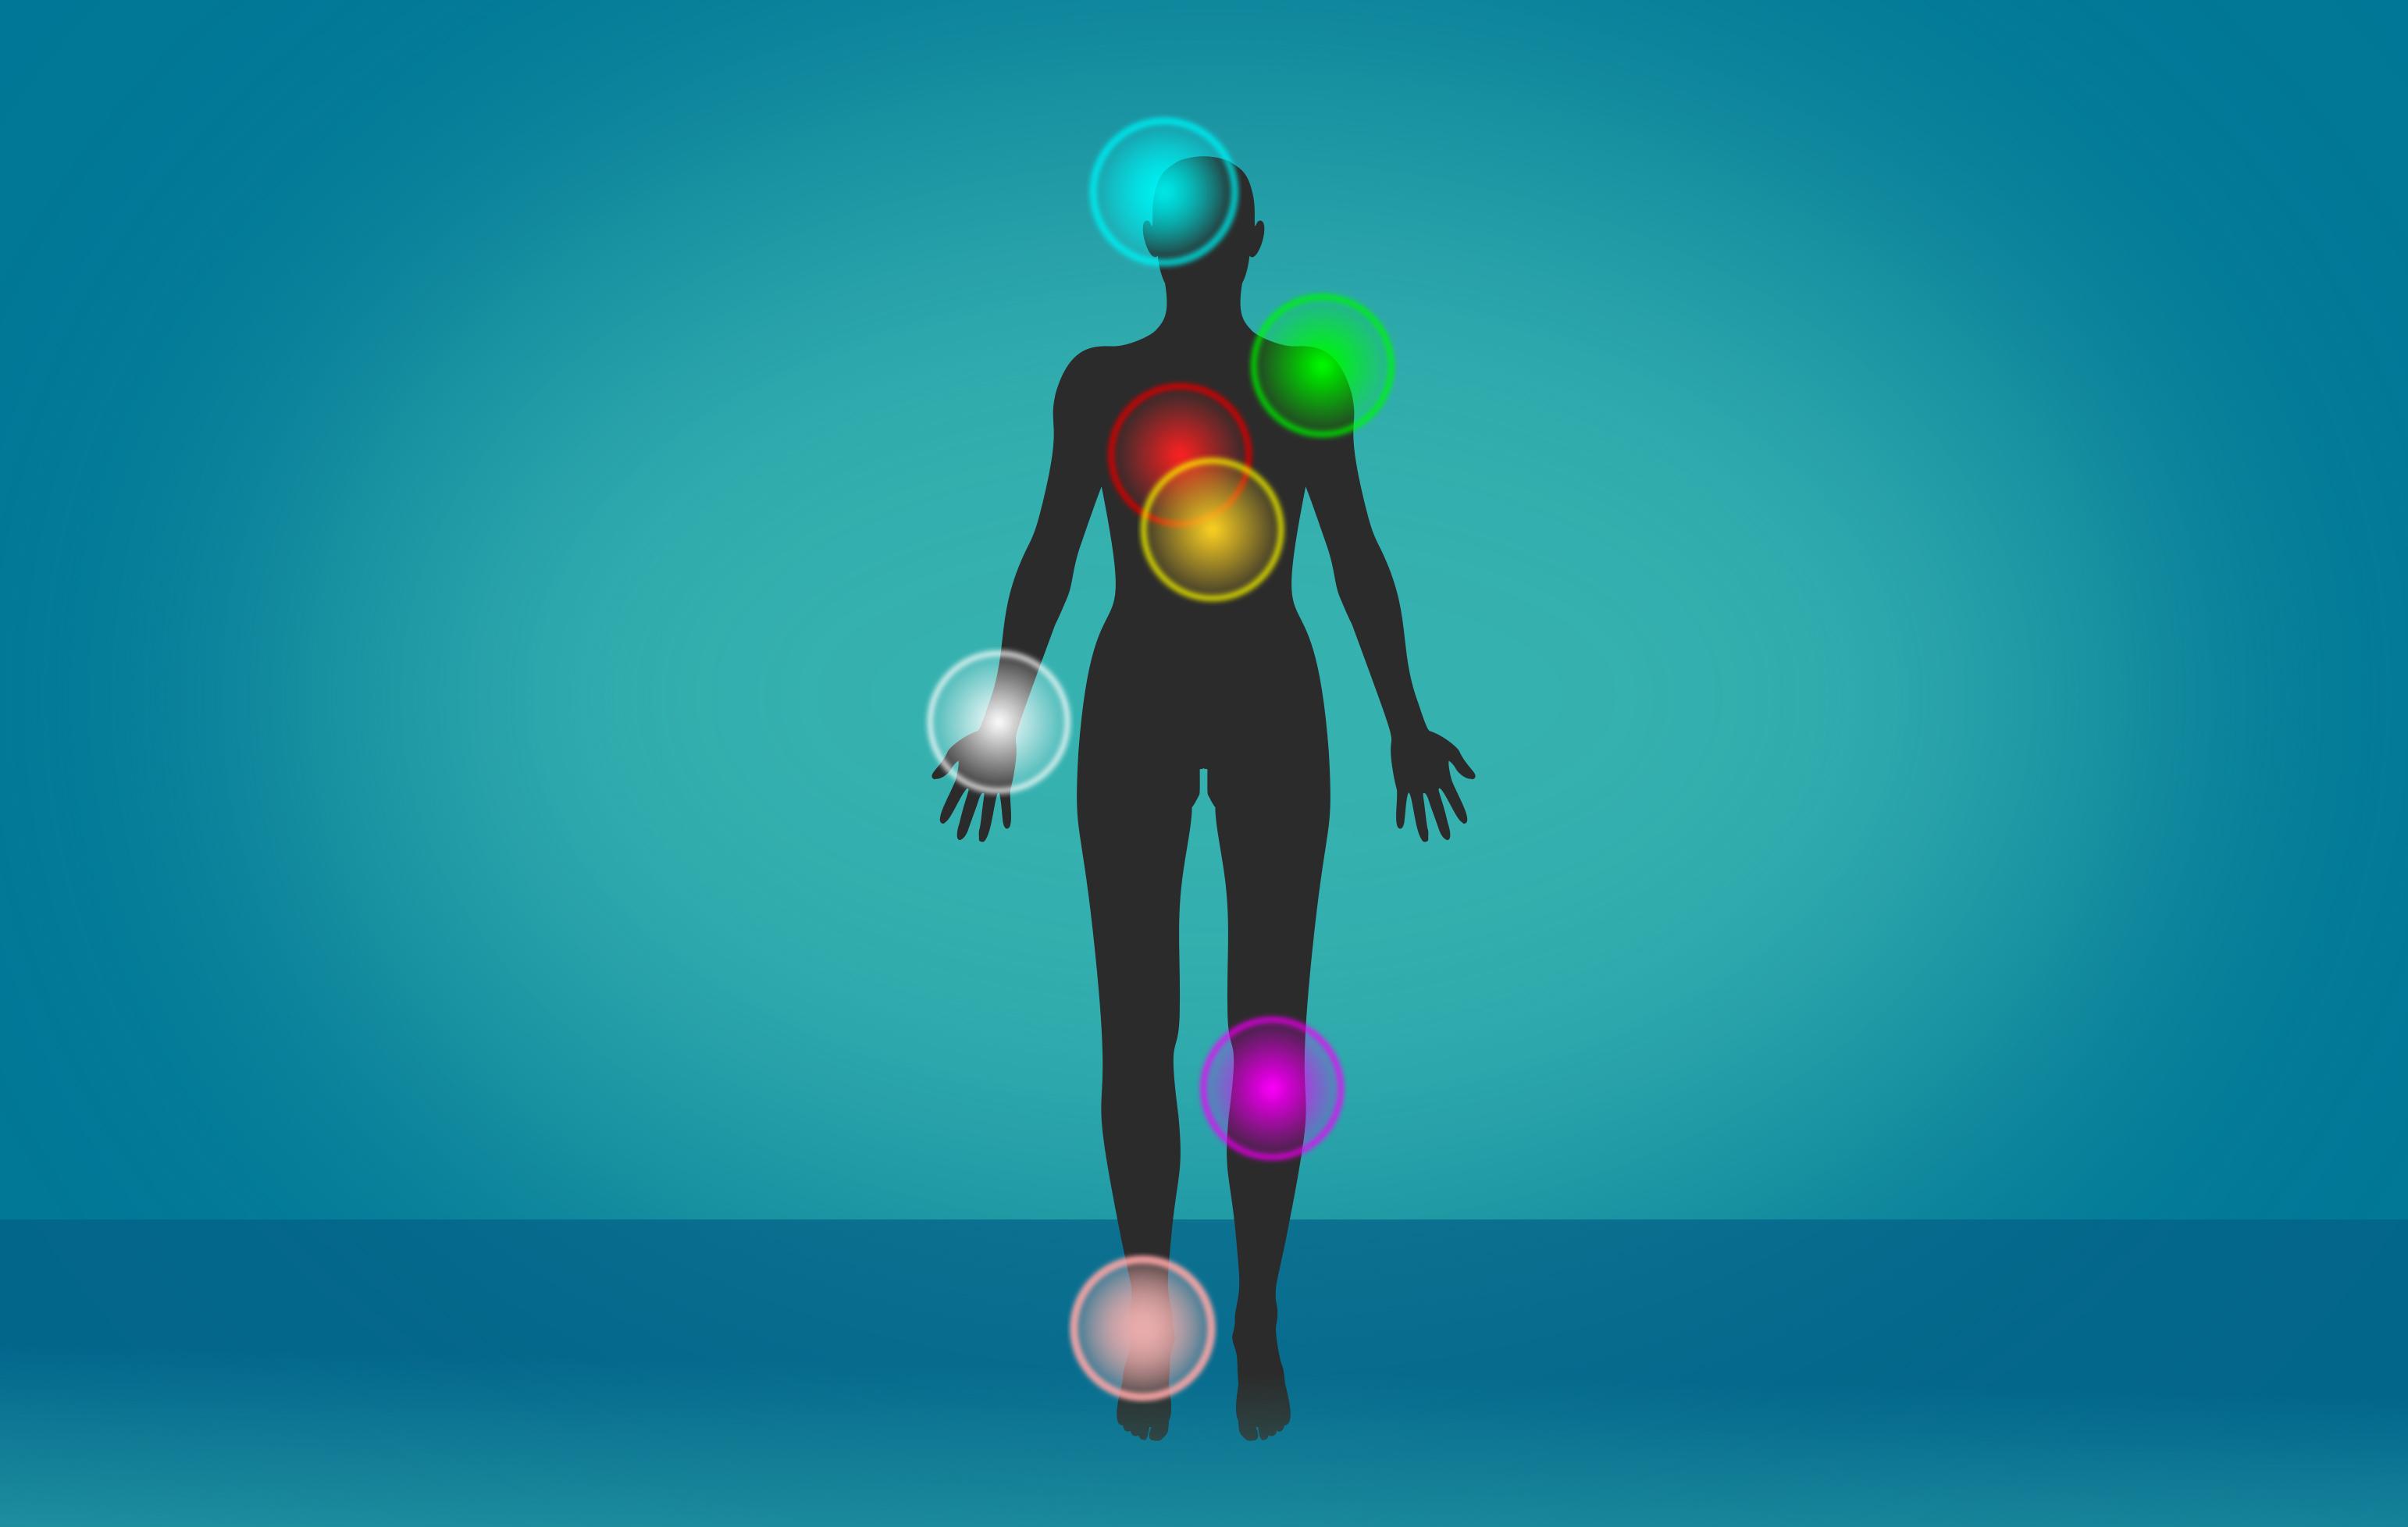 Chronic pain points - painful areas - illustration photo